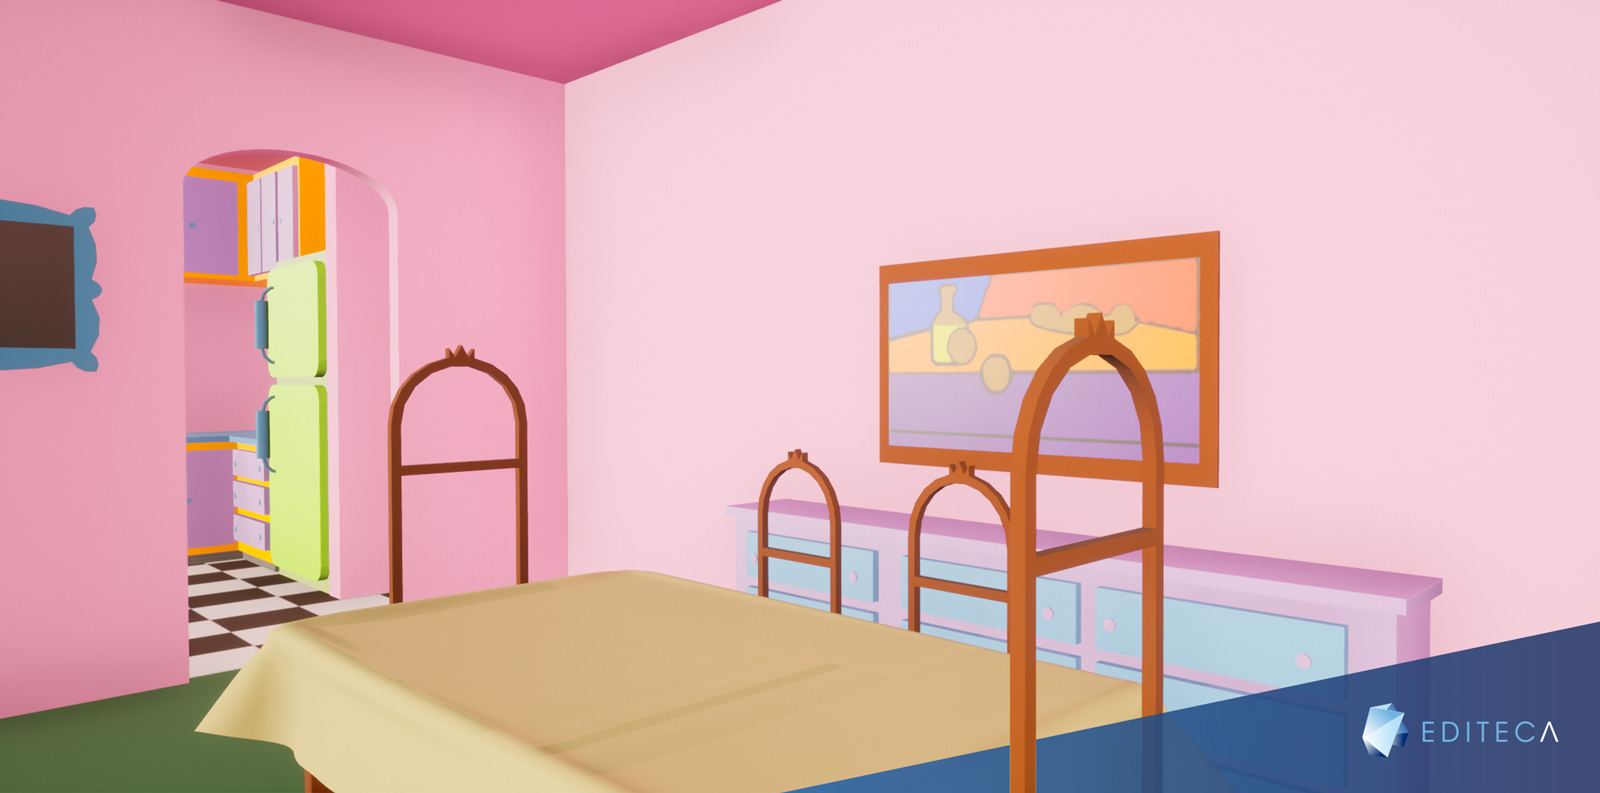 proyecto-VR-Unreal-engine-Simpsons-Editeca-4